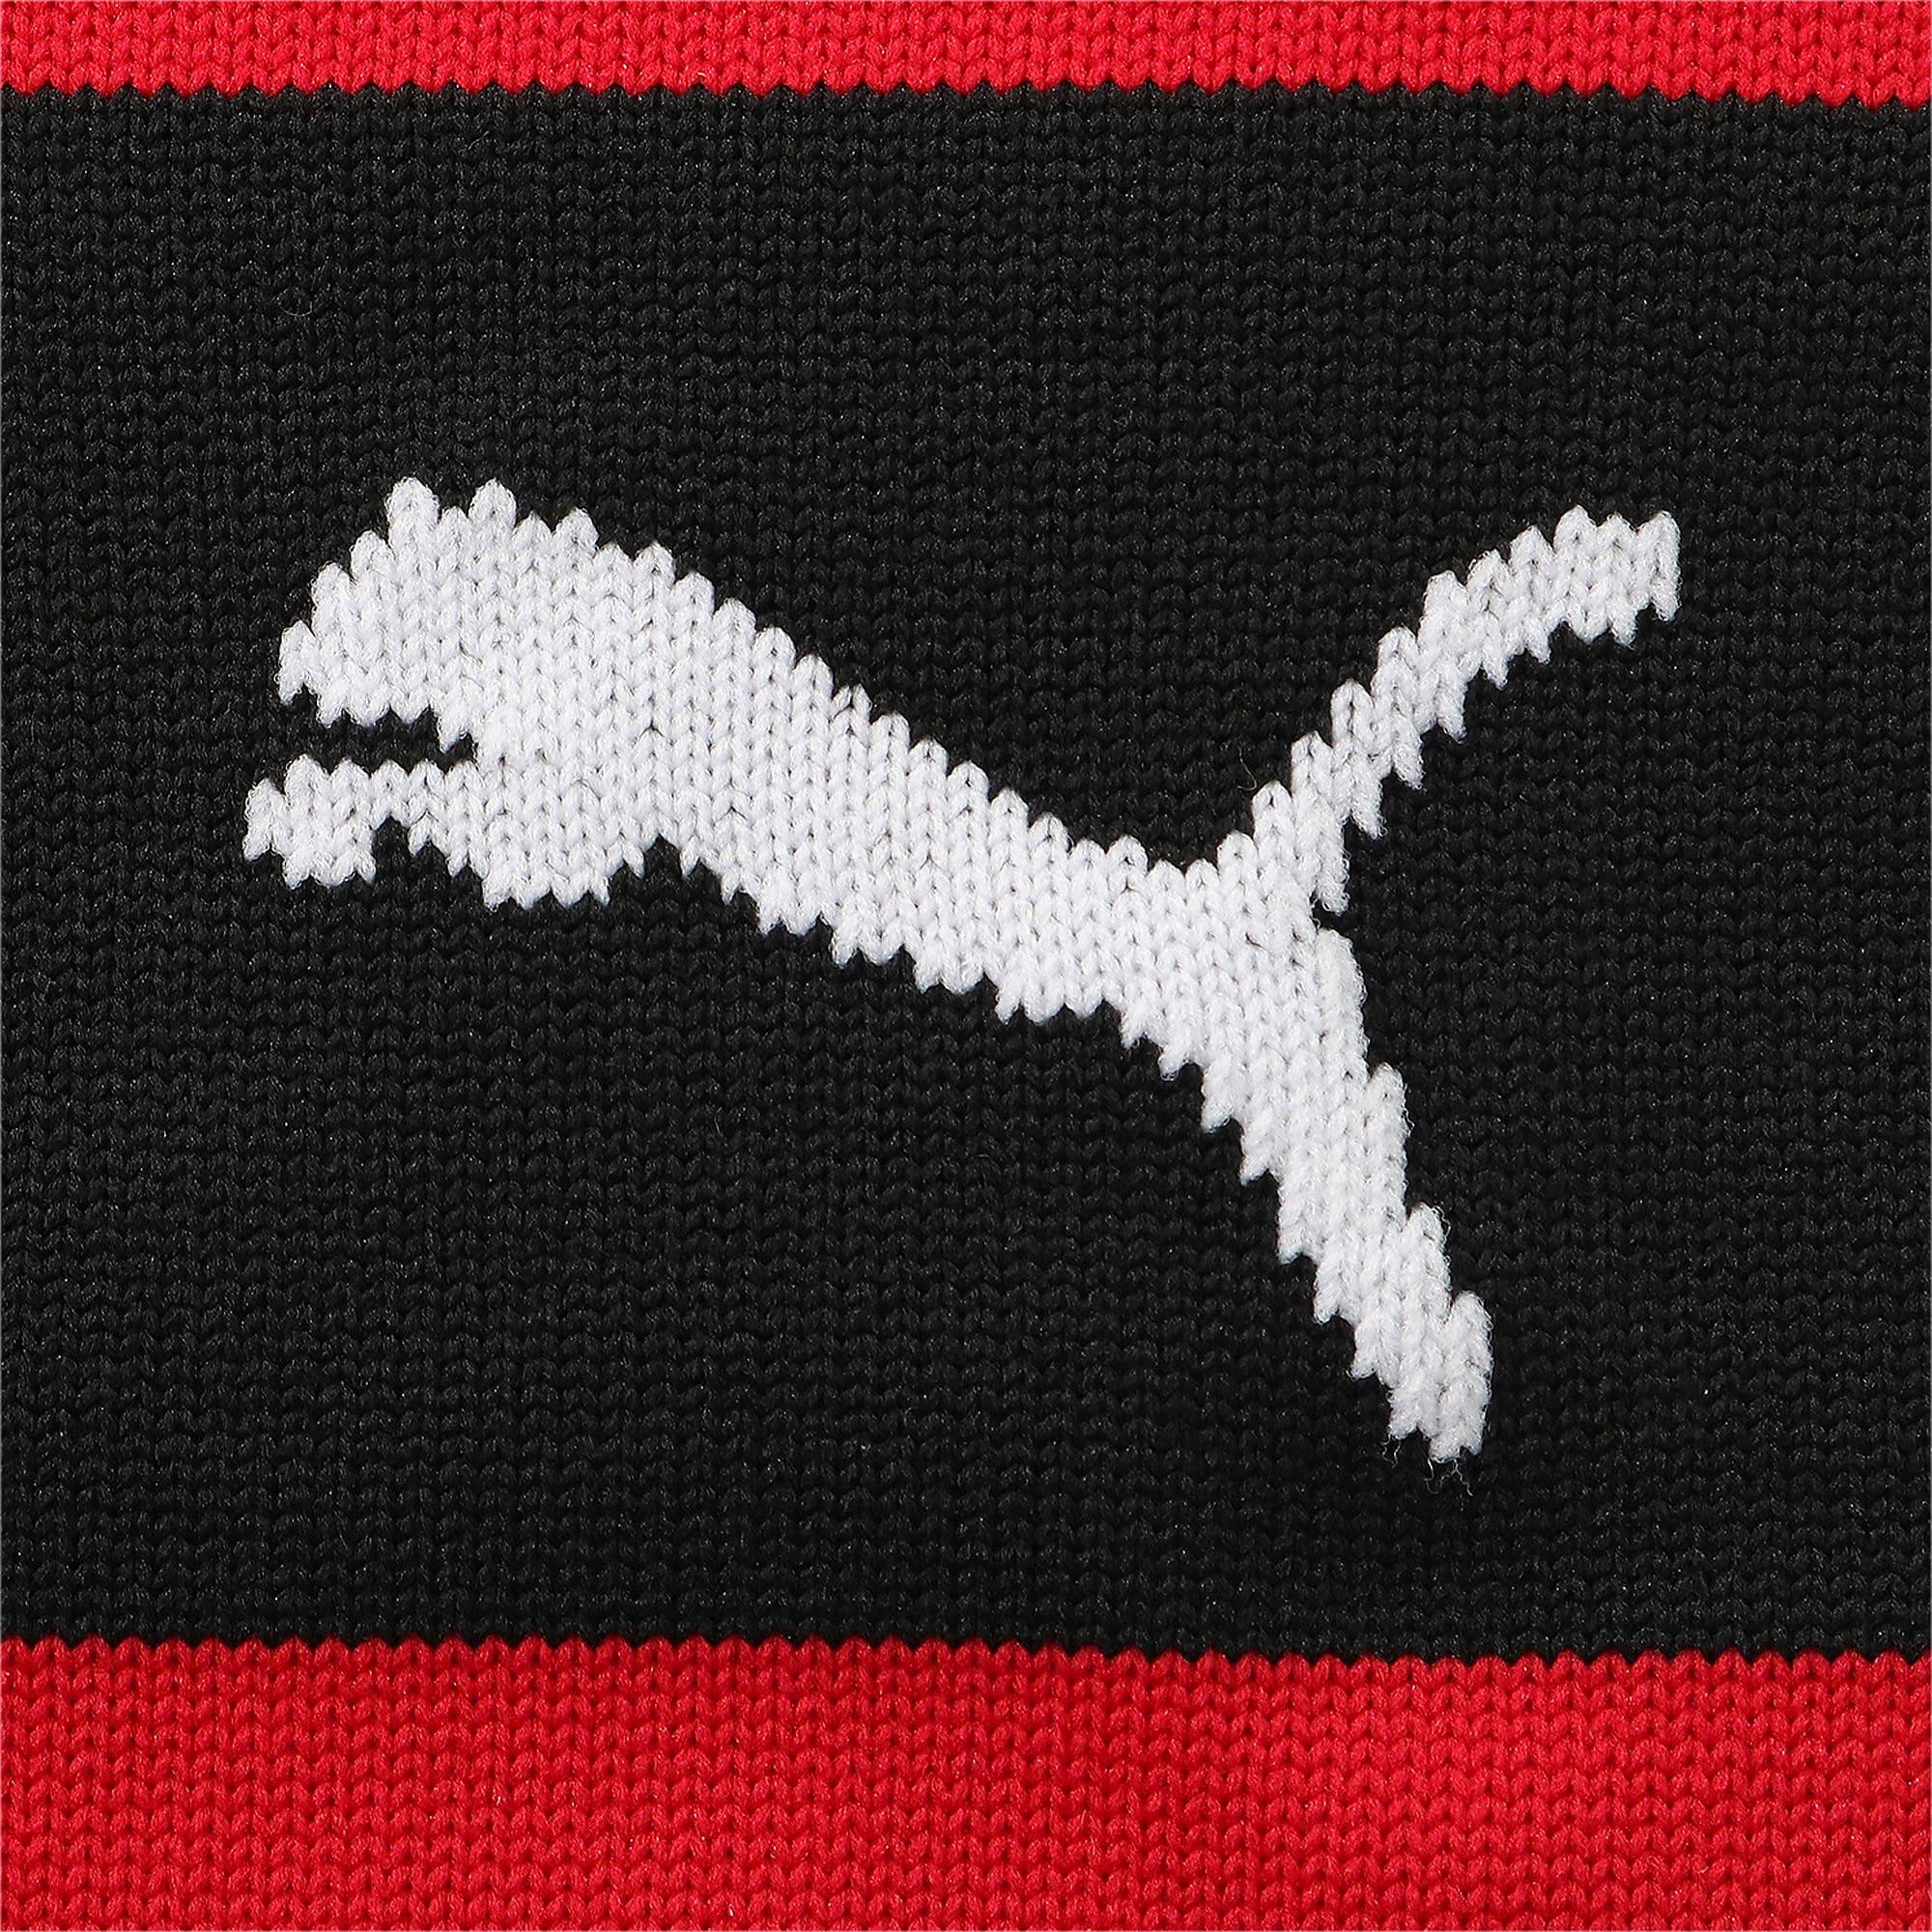 Thumbnail 2 of ACミラン ACM バンド ストッキング, Puma Black-Tango Red, medium-JPN